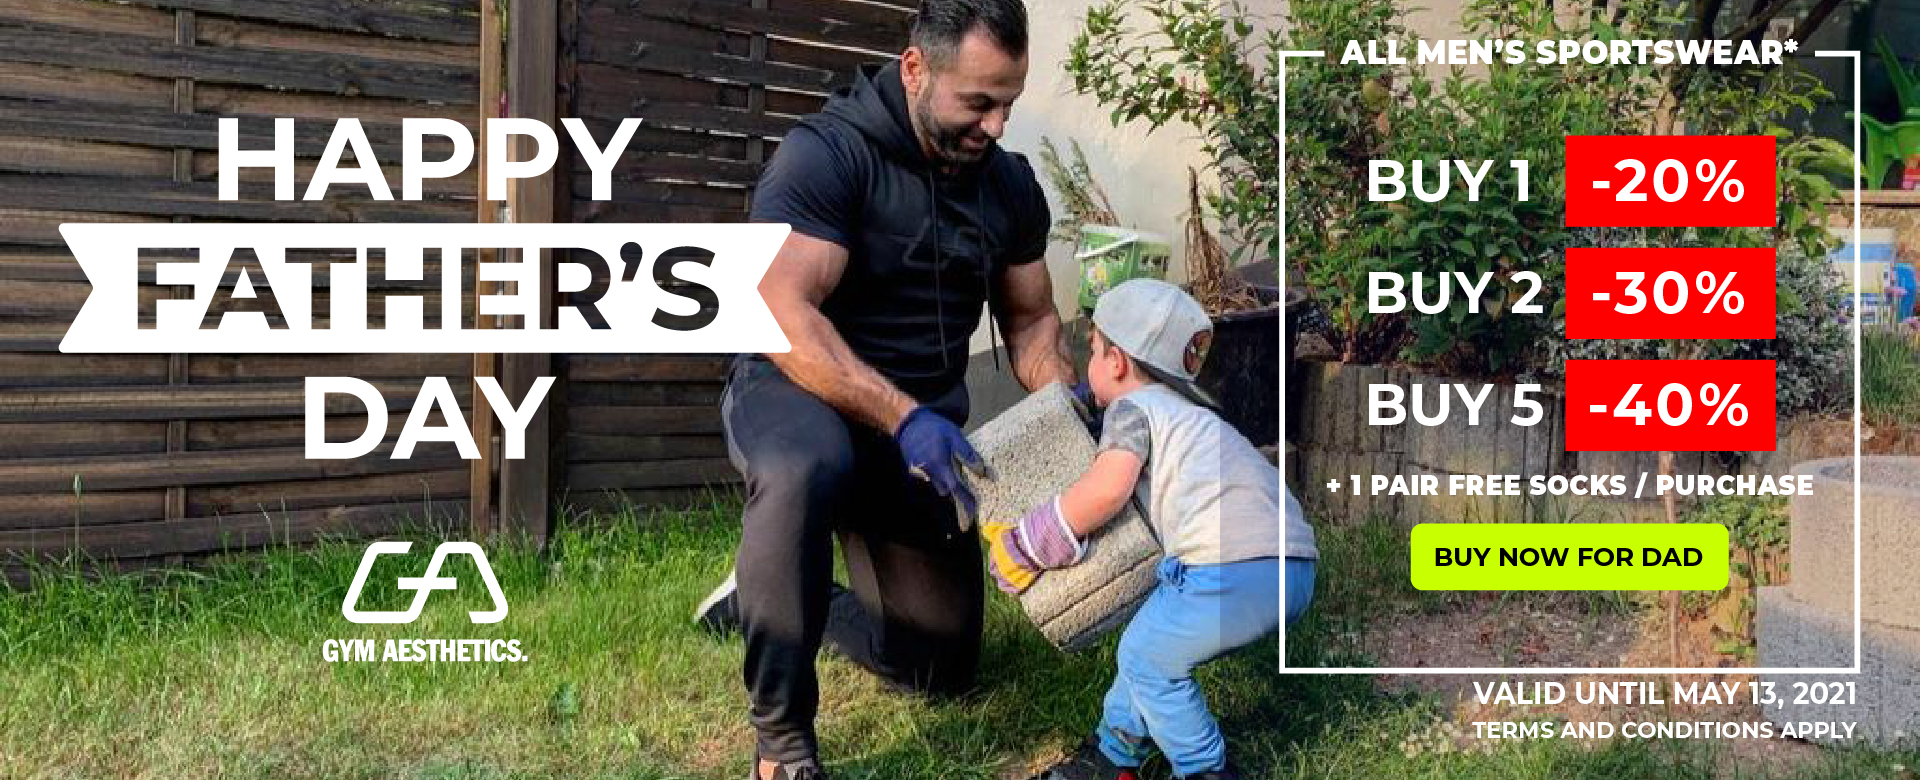 Happy Father's Day   Gym Aesthetics